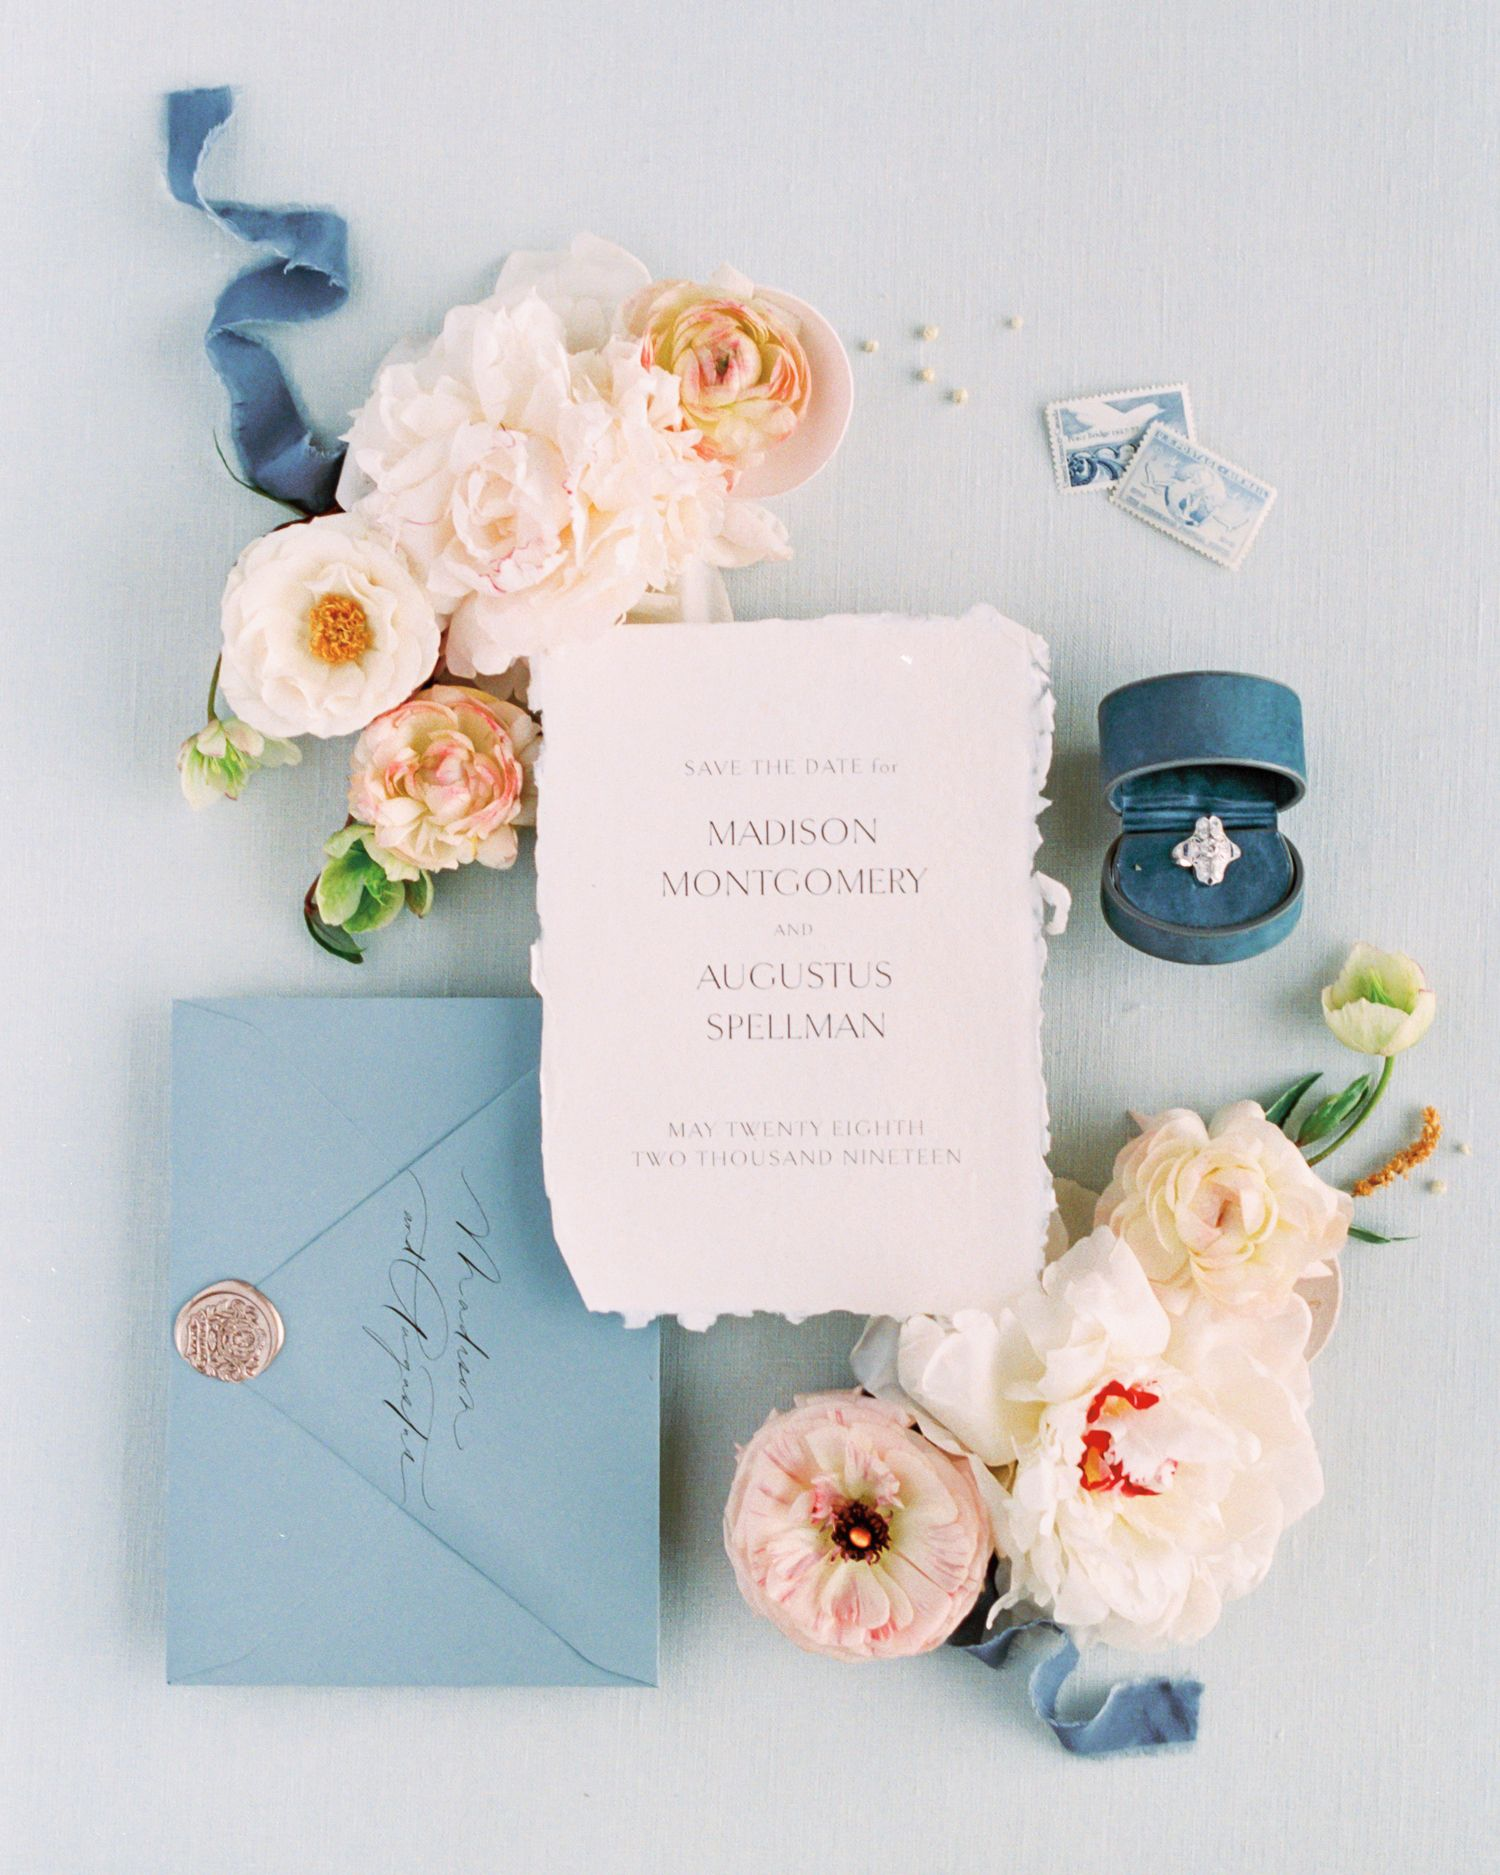 Carlton Cards Wedding Invitations: Modern Amalfi Coast-Inspired Wedding Shoot At Marina Del